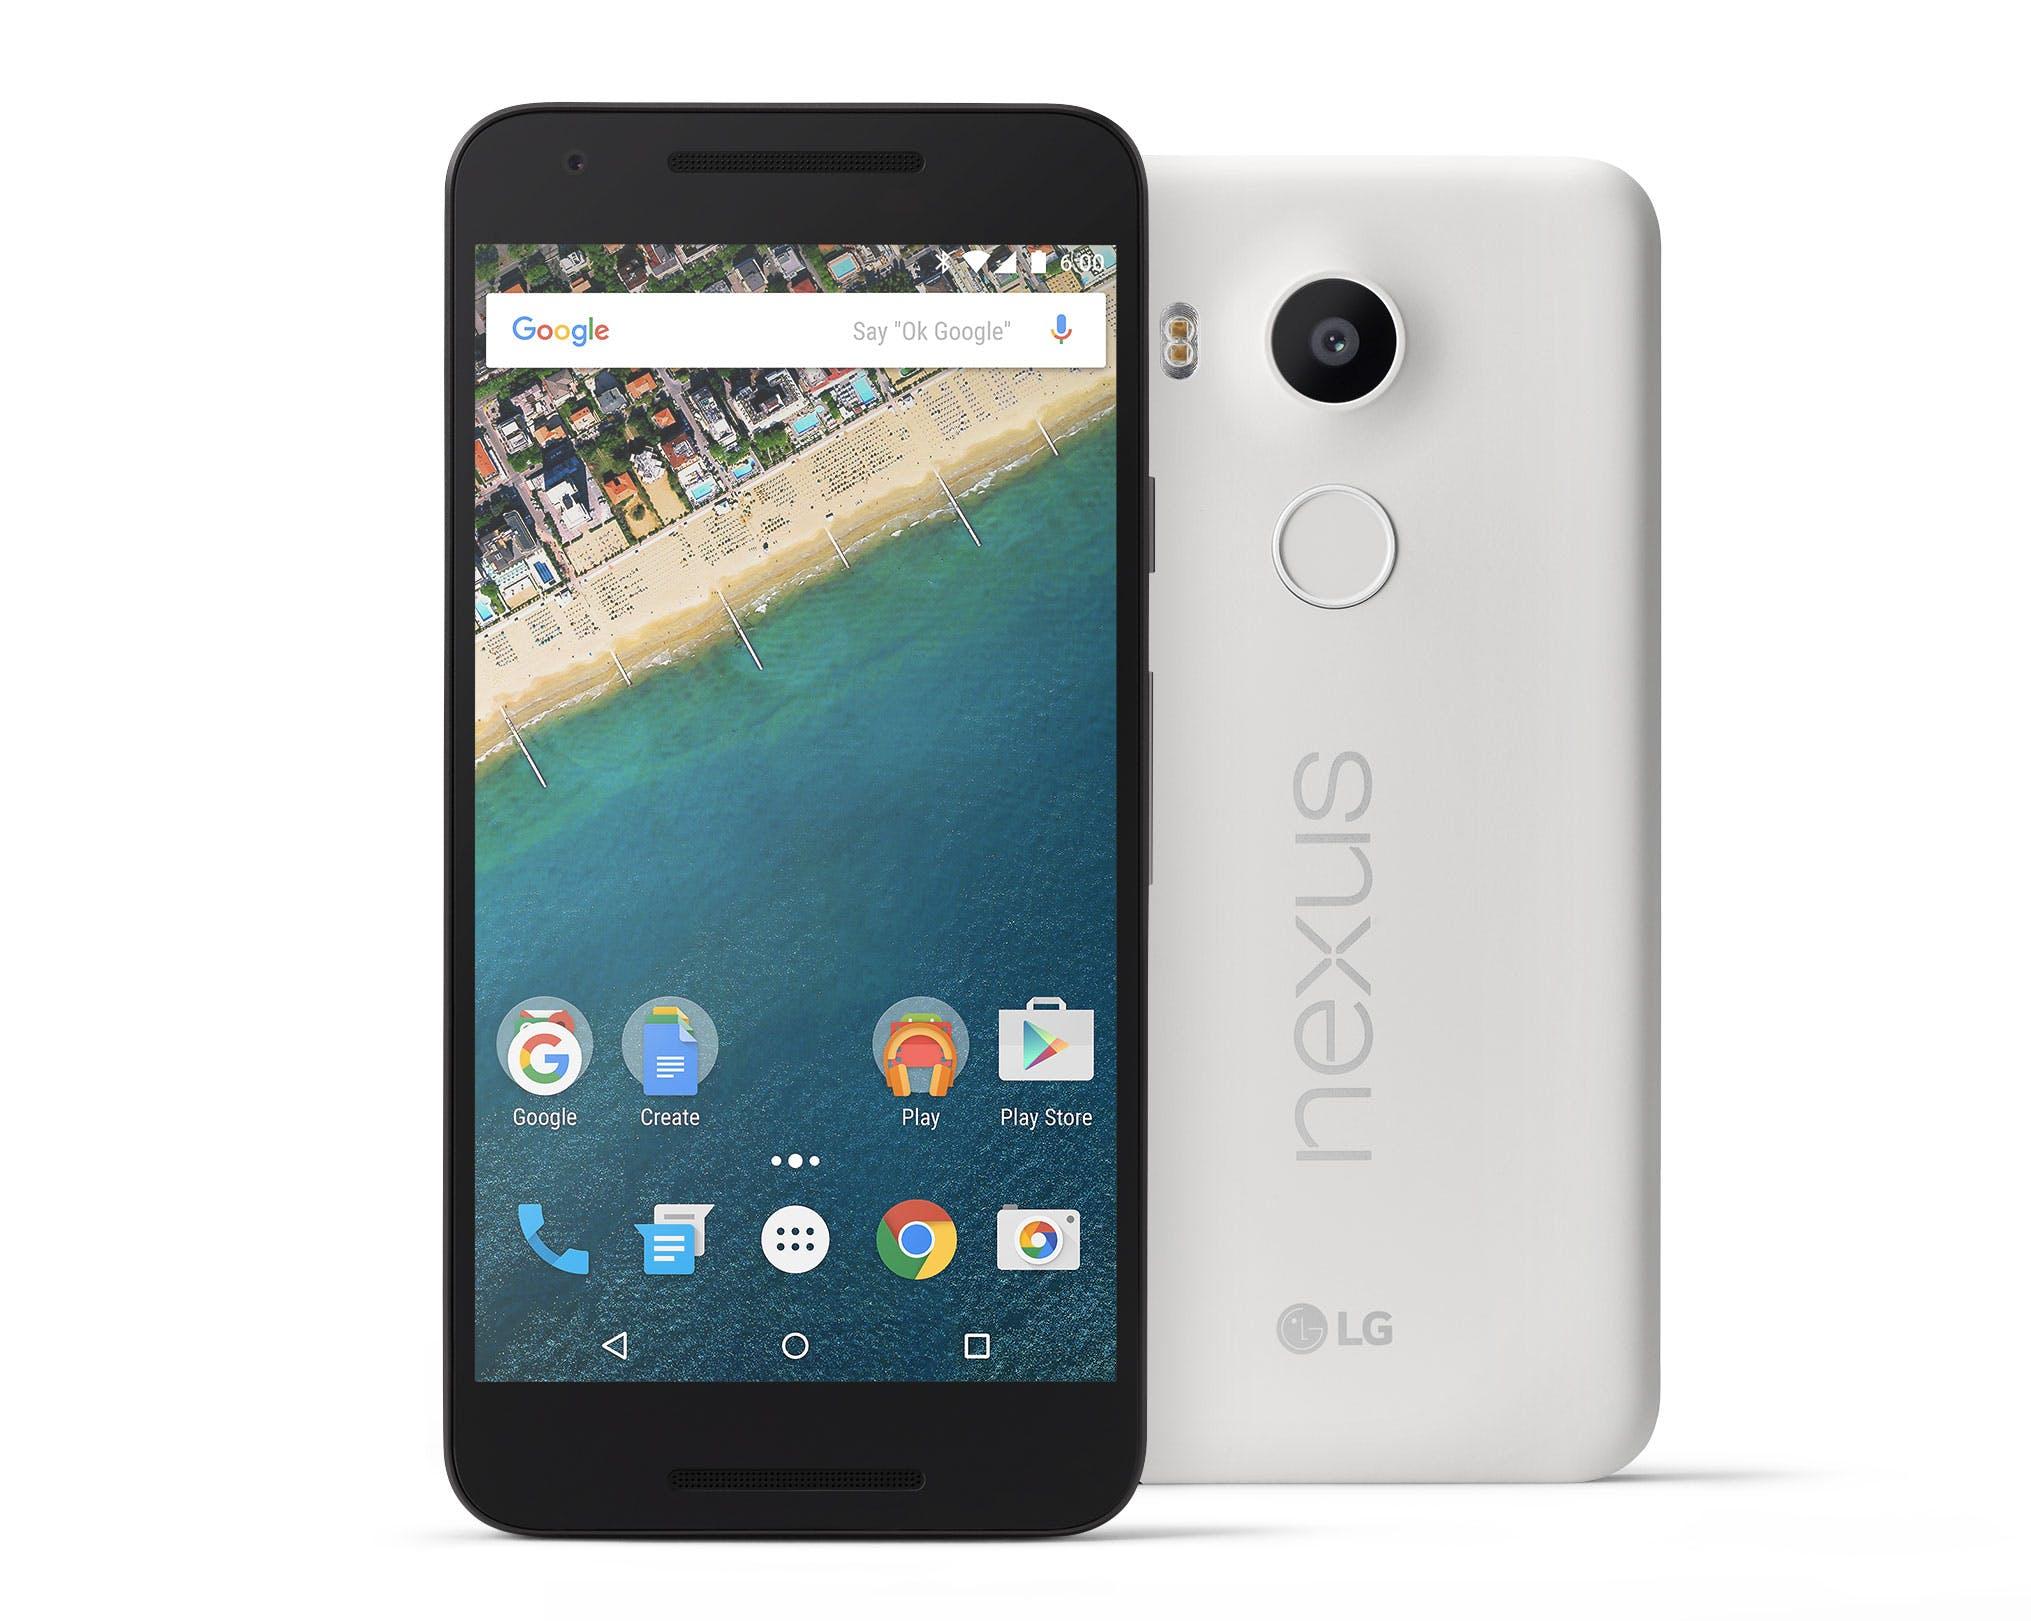 Google Nexus 5X publicly revealed